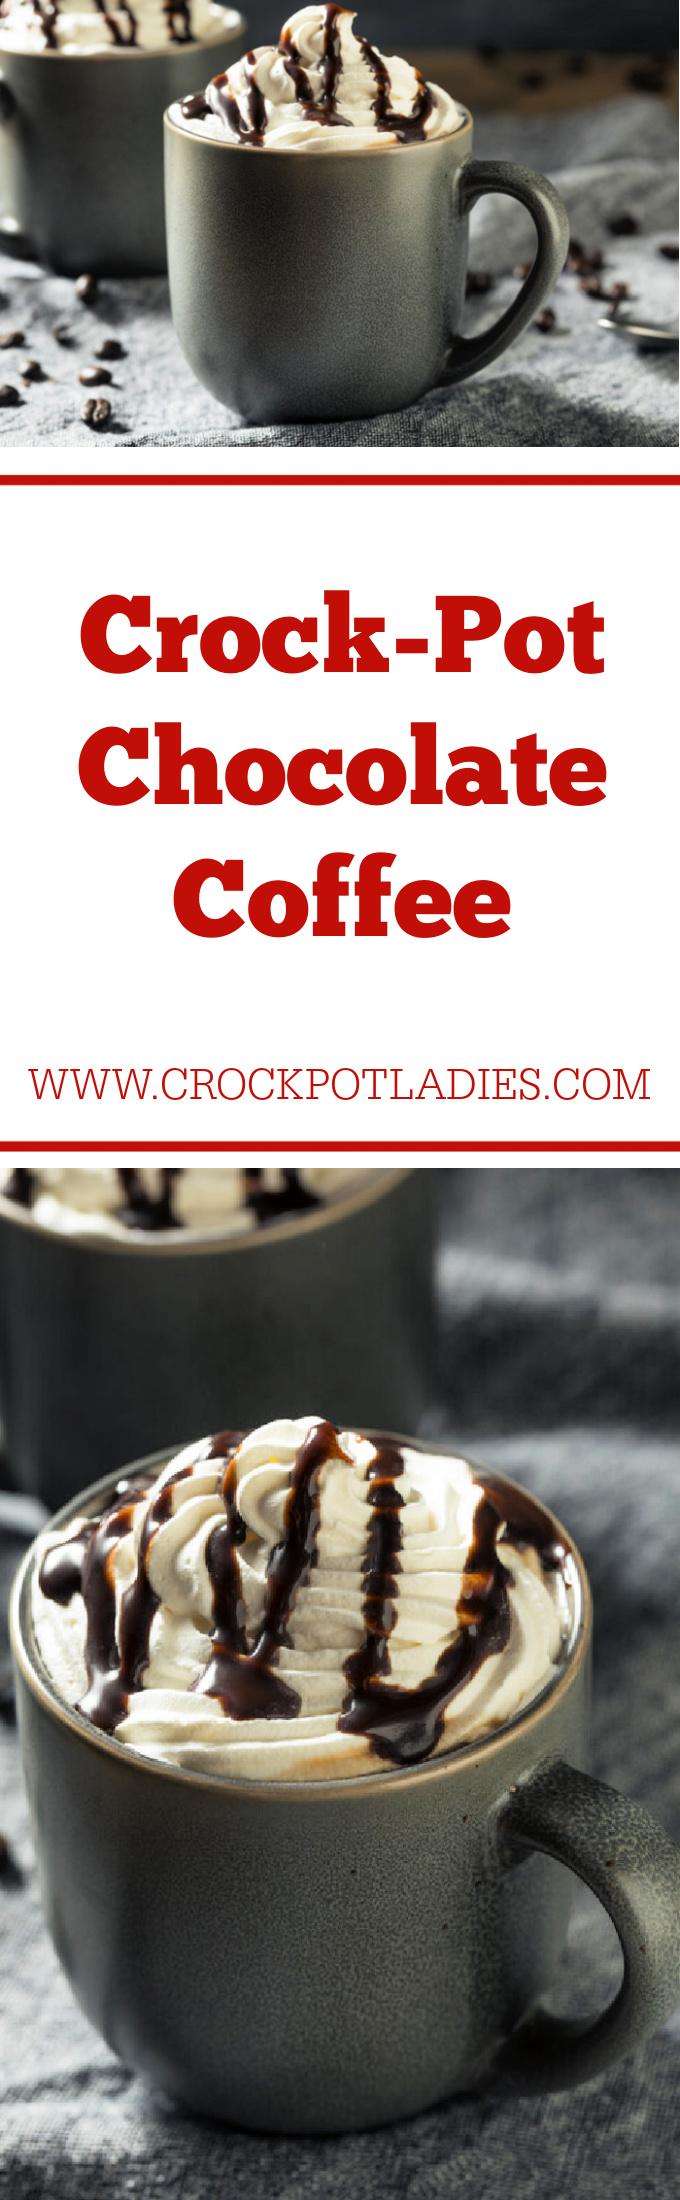 Crock-Pot Chocolate Coffee